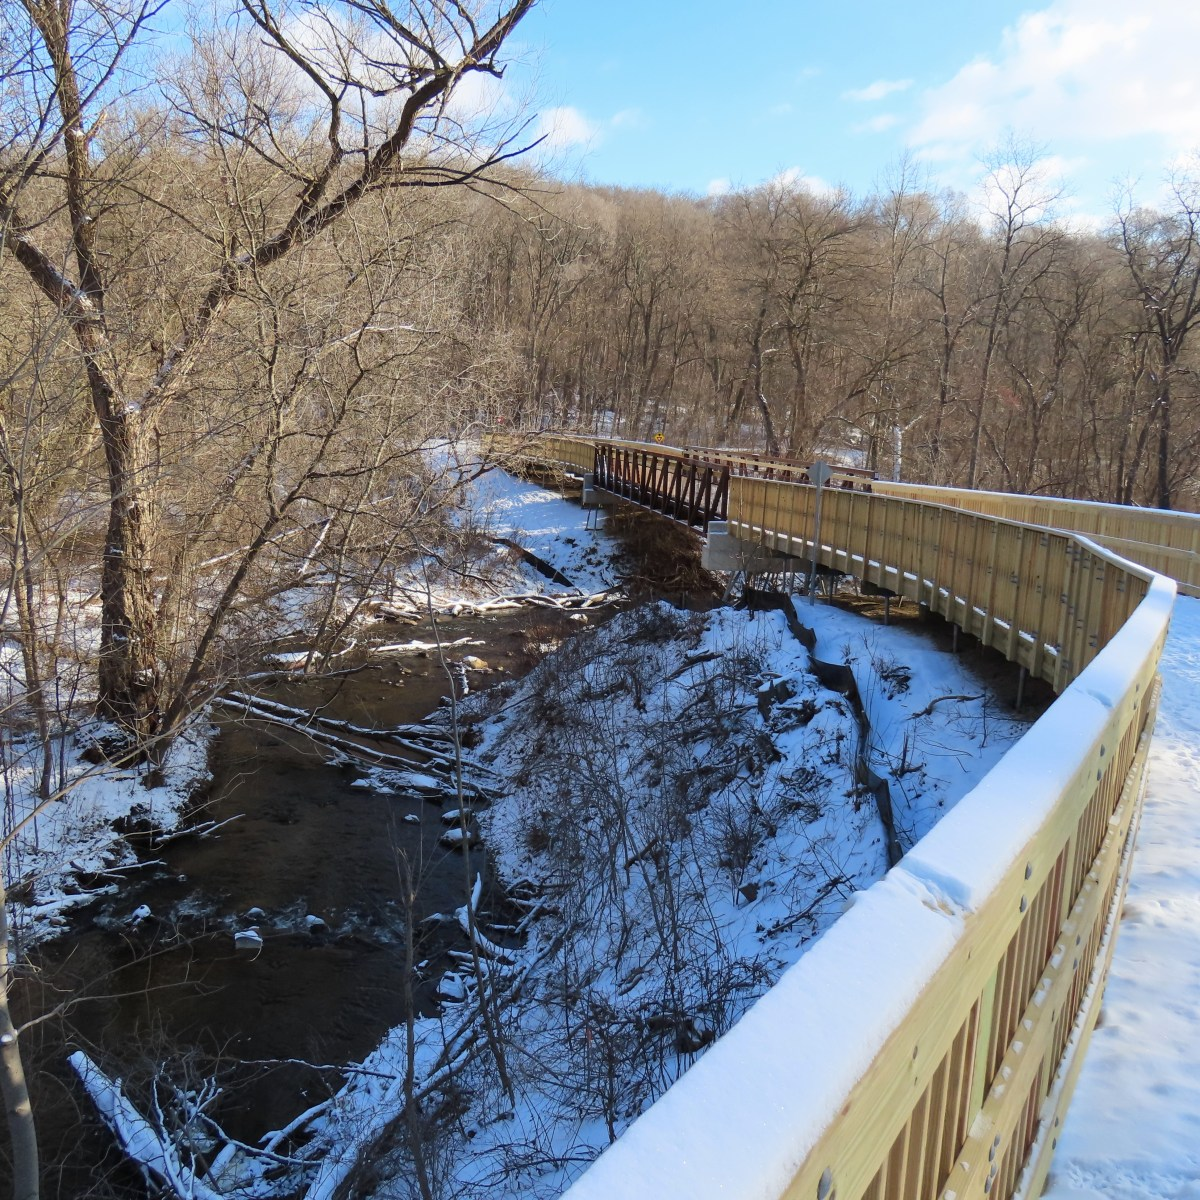 A wood-railed pedestrian bridge covered in snow